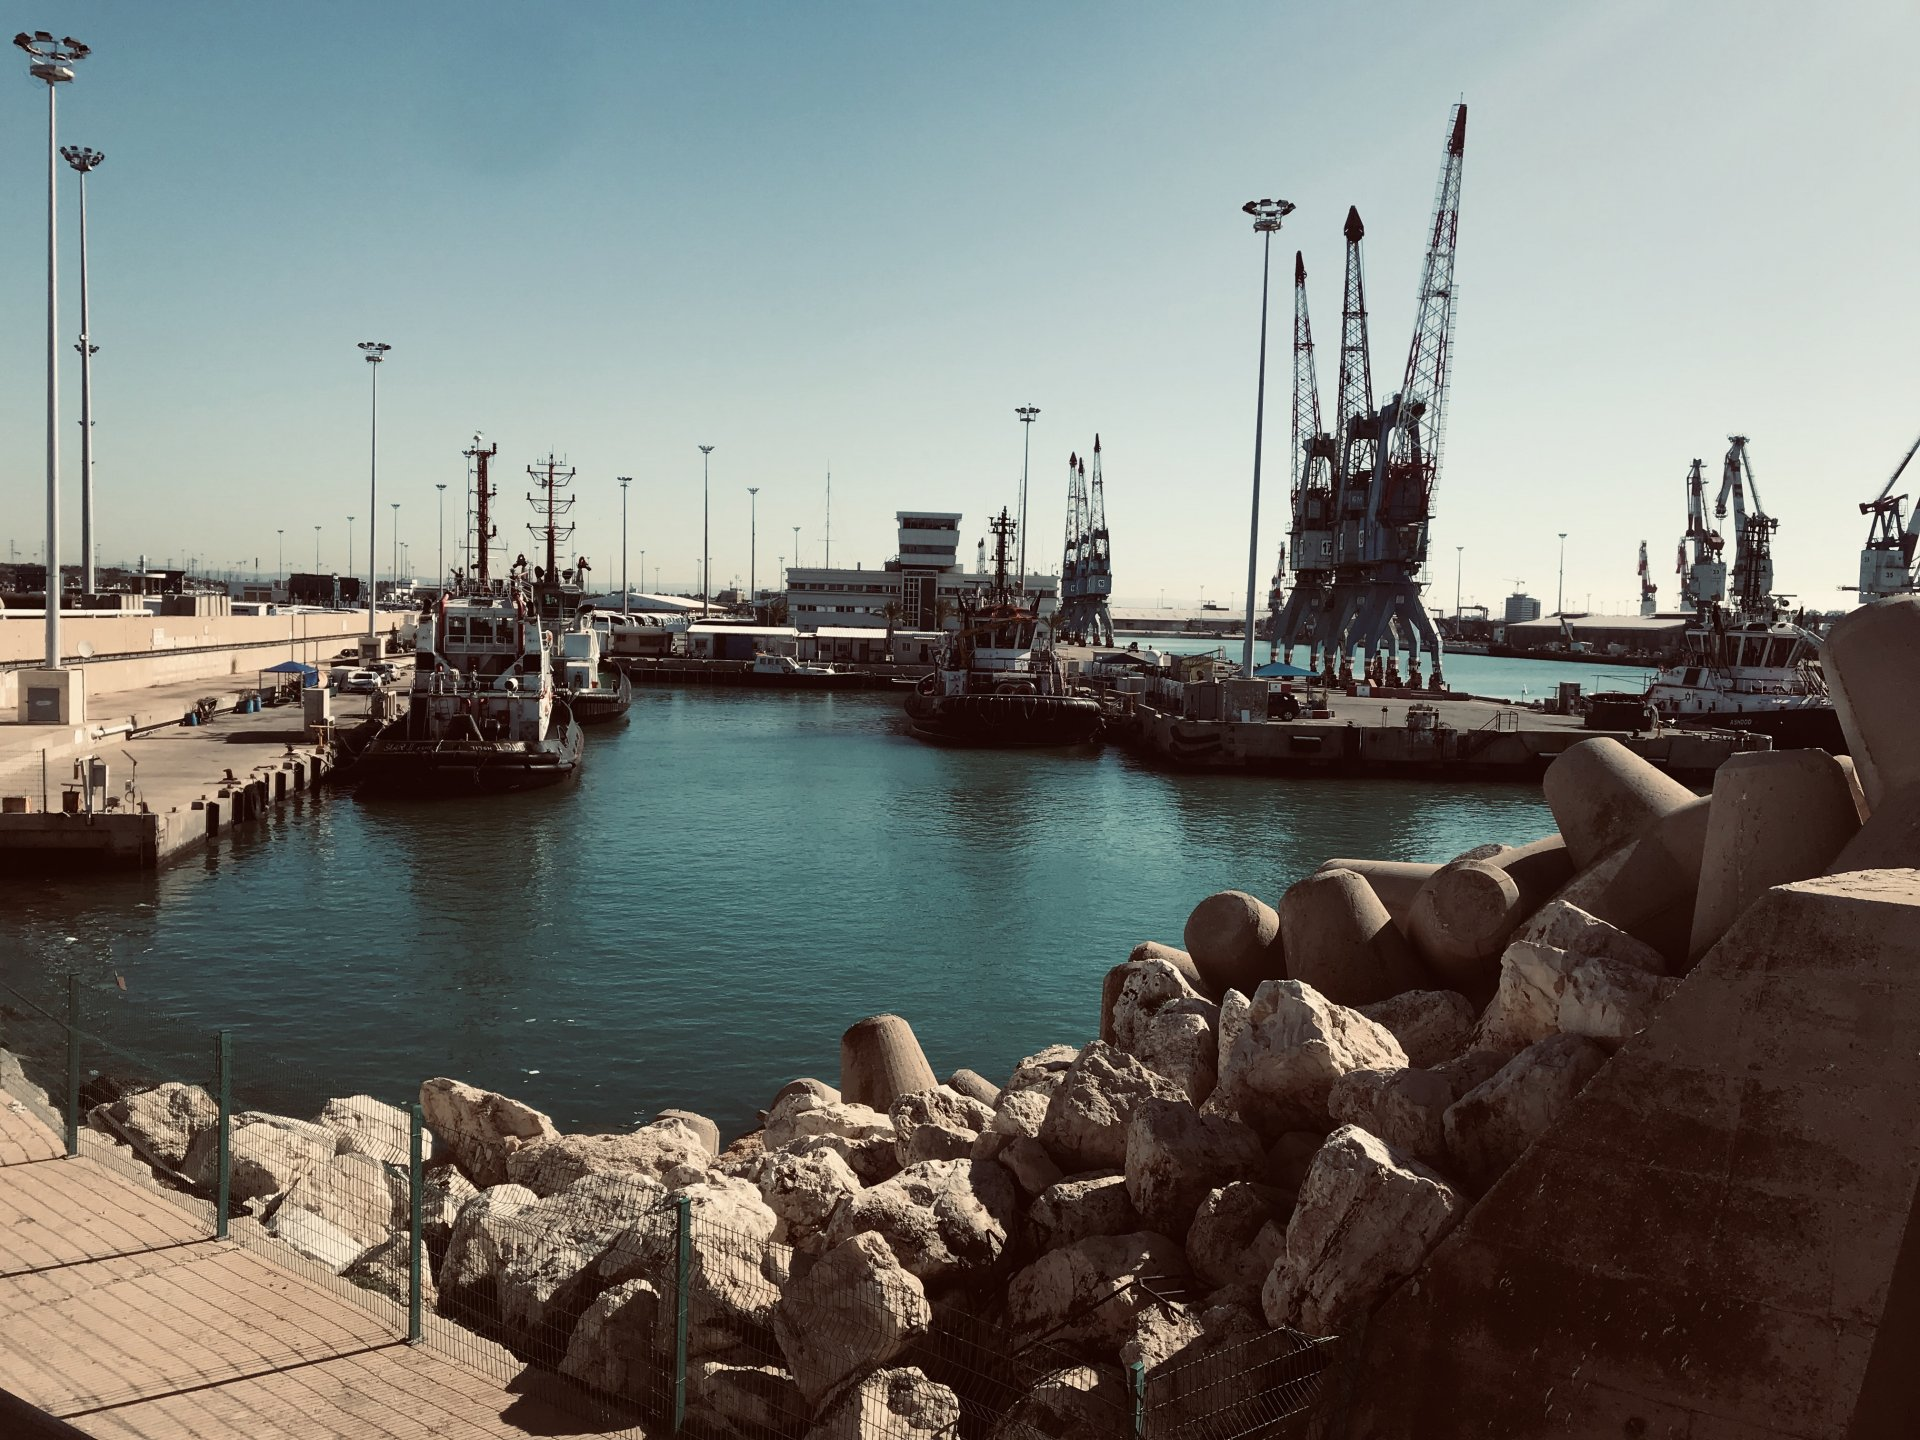 נמל אשדוד צילום: חלי דהן-פוני